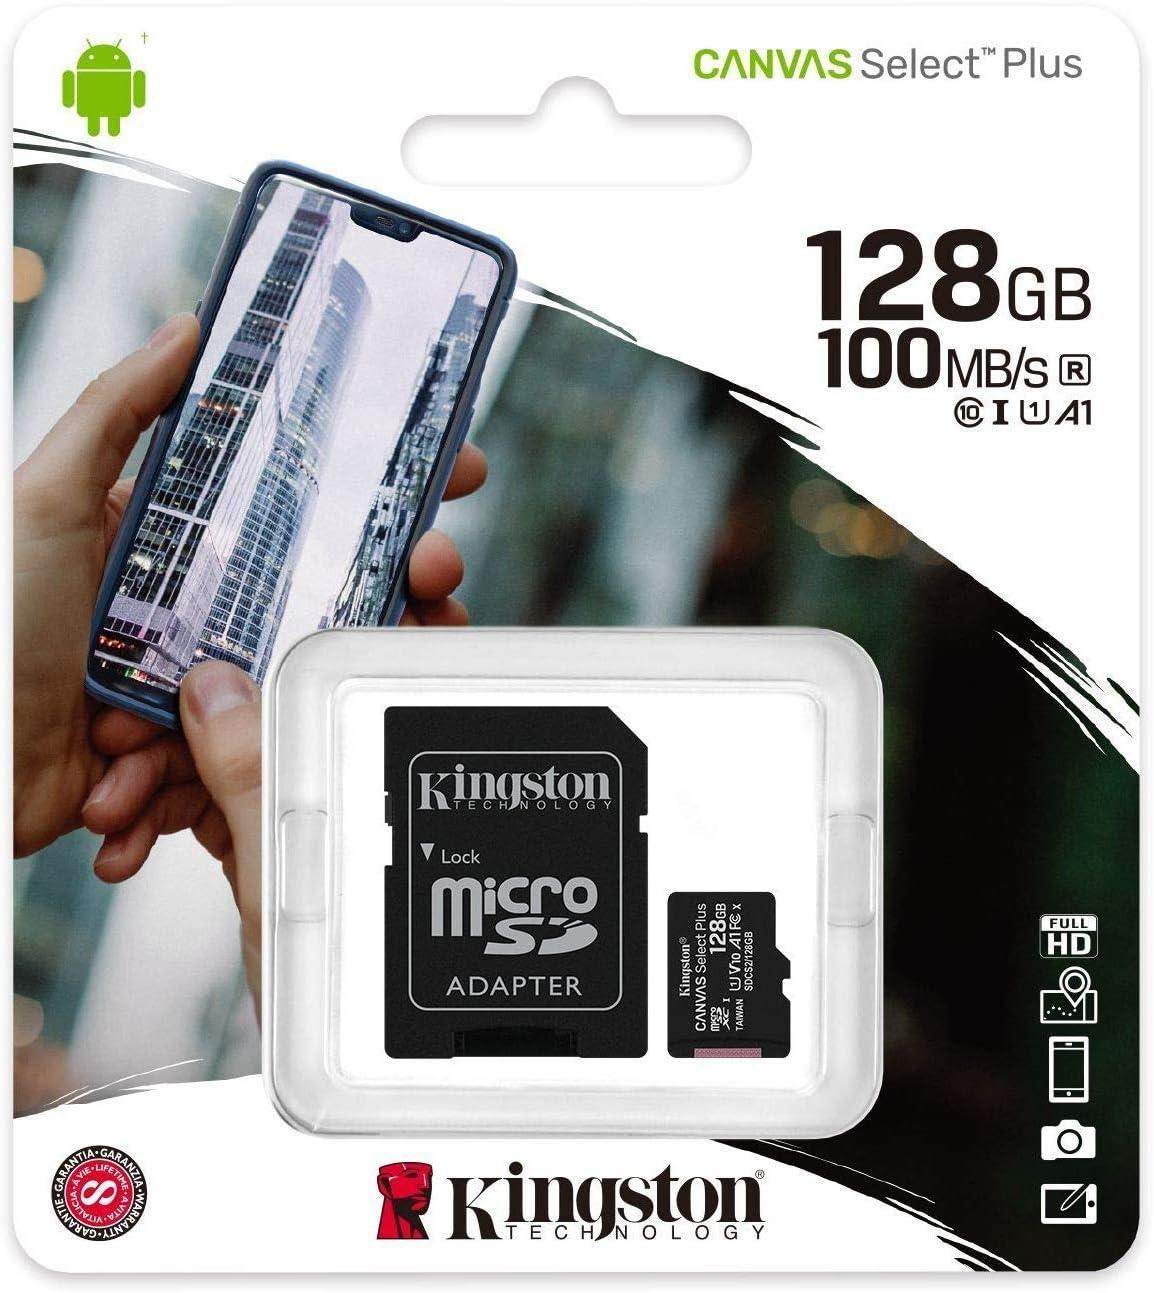 Kingston Canvas Select 128GB MicroSD XC Class 10 Memory Card UHS-I TF 80MB/s SDCS2/128GB with Dual Slot MemoryMarket MicroSD & SD Memory Card Reader